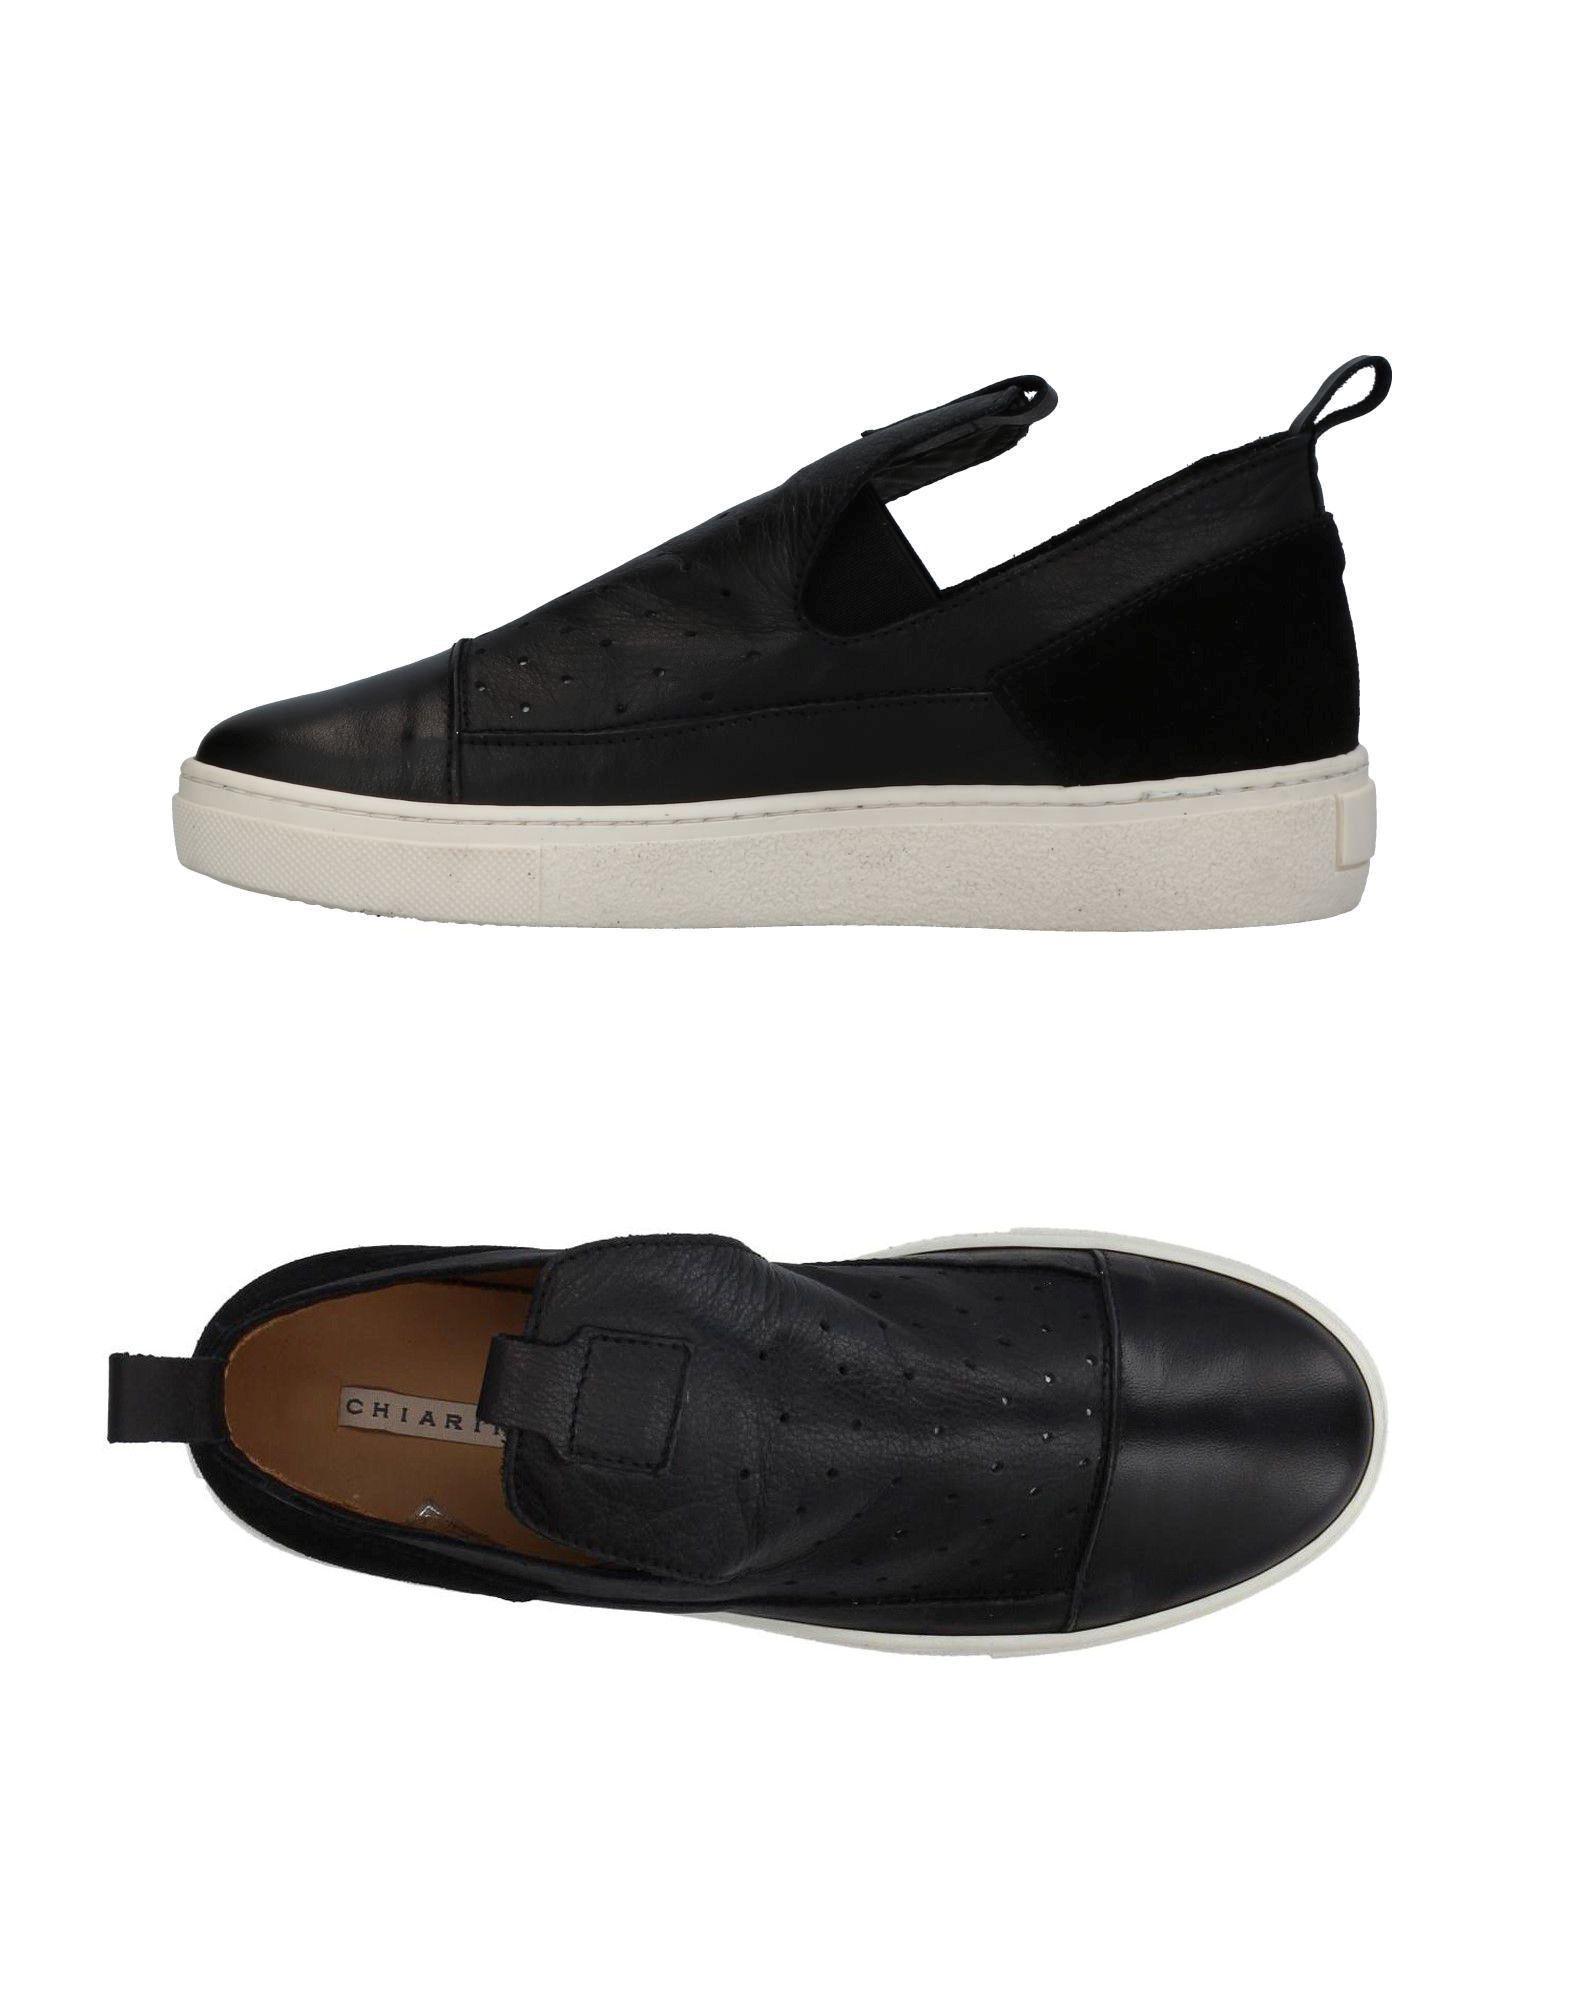 FOOTWEAR - Low-tops & sneakers Chiarini Bologna 1u3CItpIQ